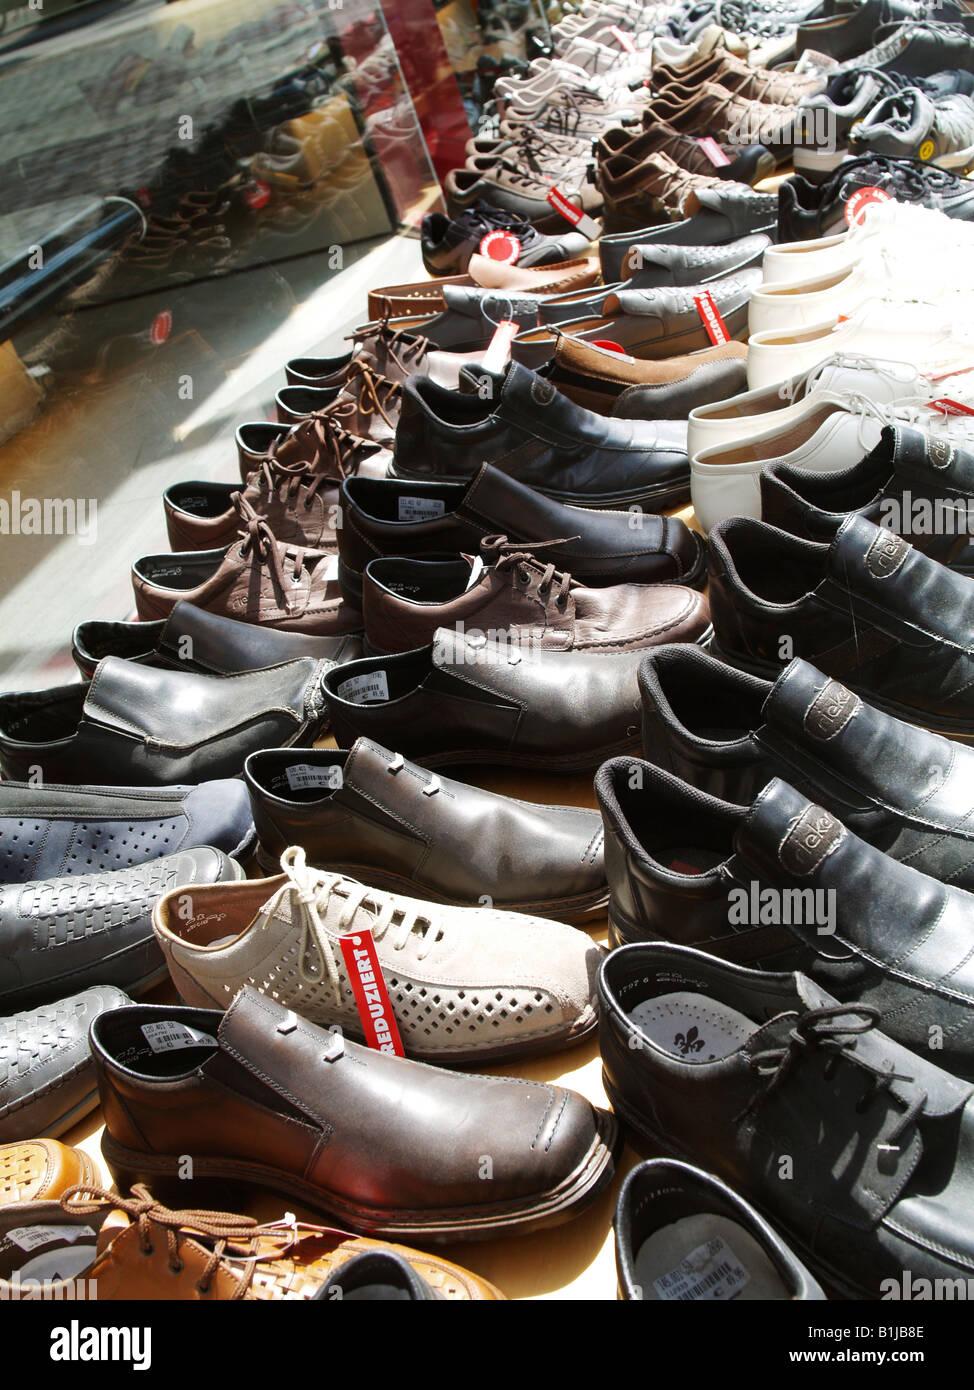 diverse mens shoes Stock Photo: 18229022 Alamy